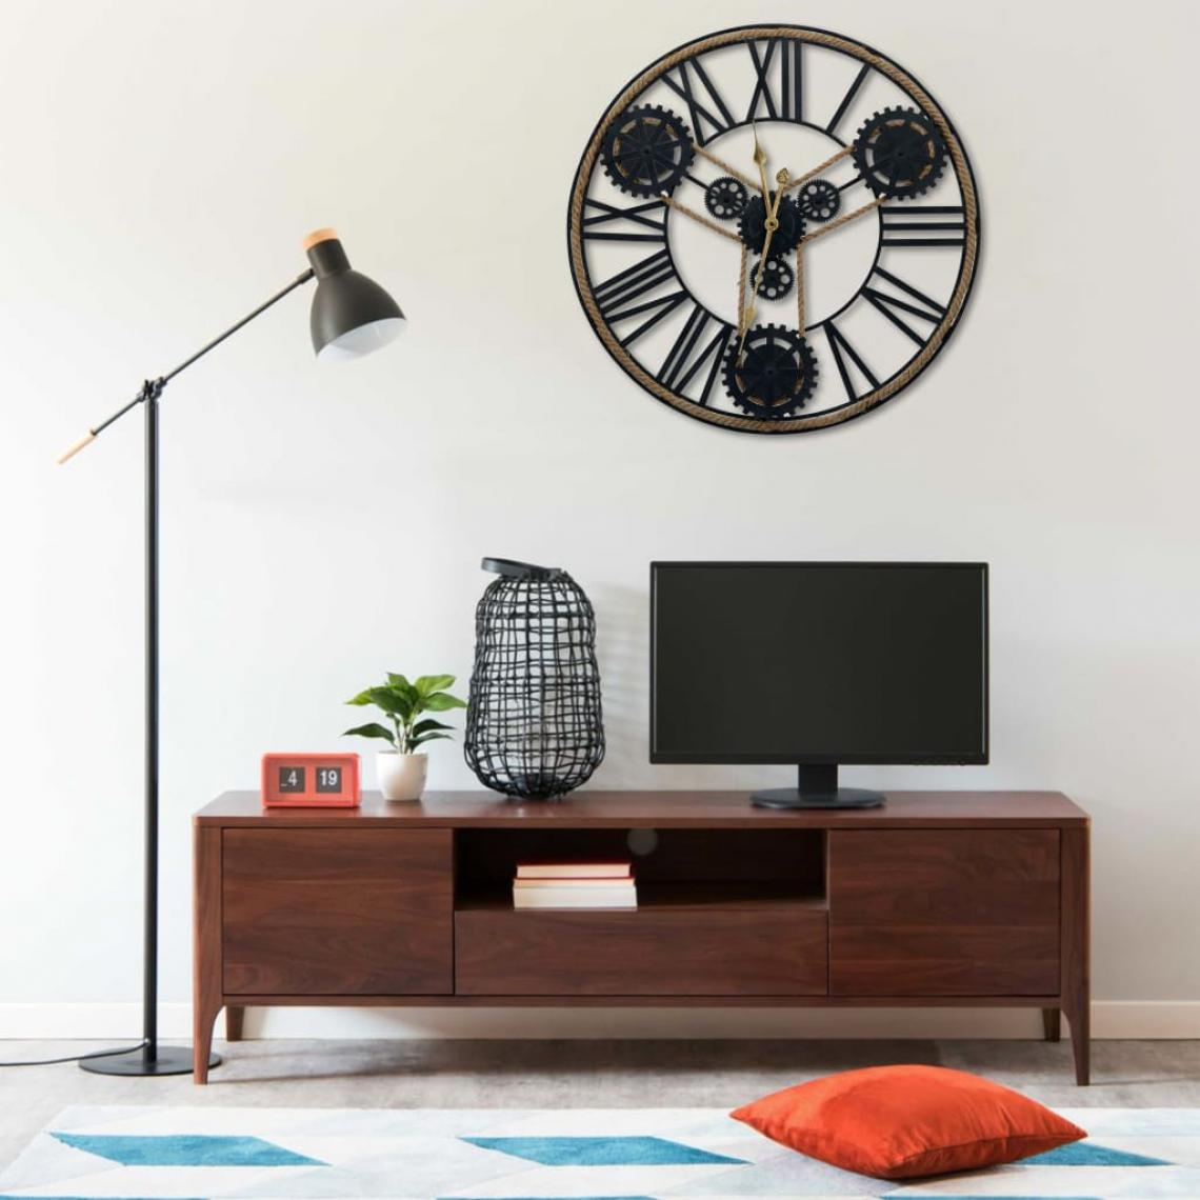 Vidaxl vidaXL Horloge murale Noir 80 cm Métal